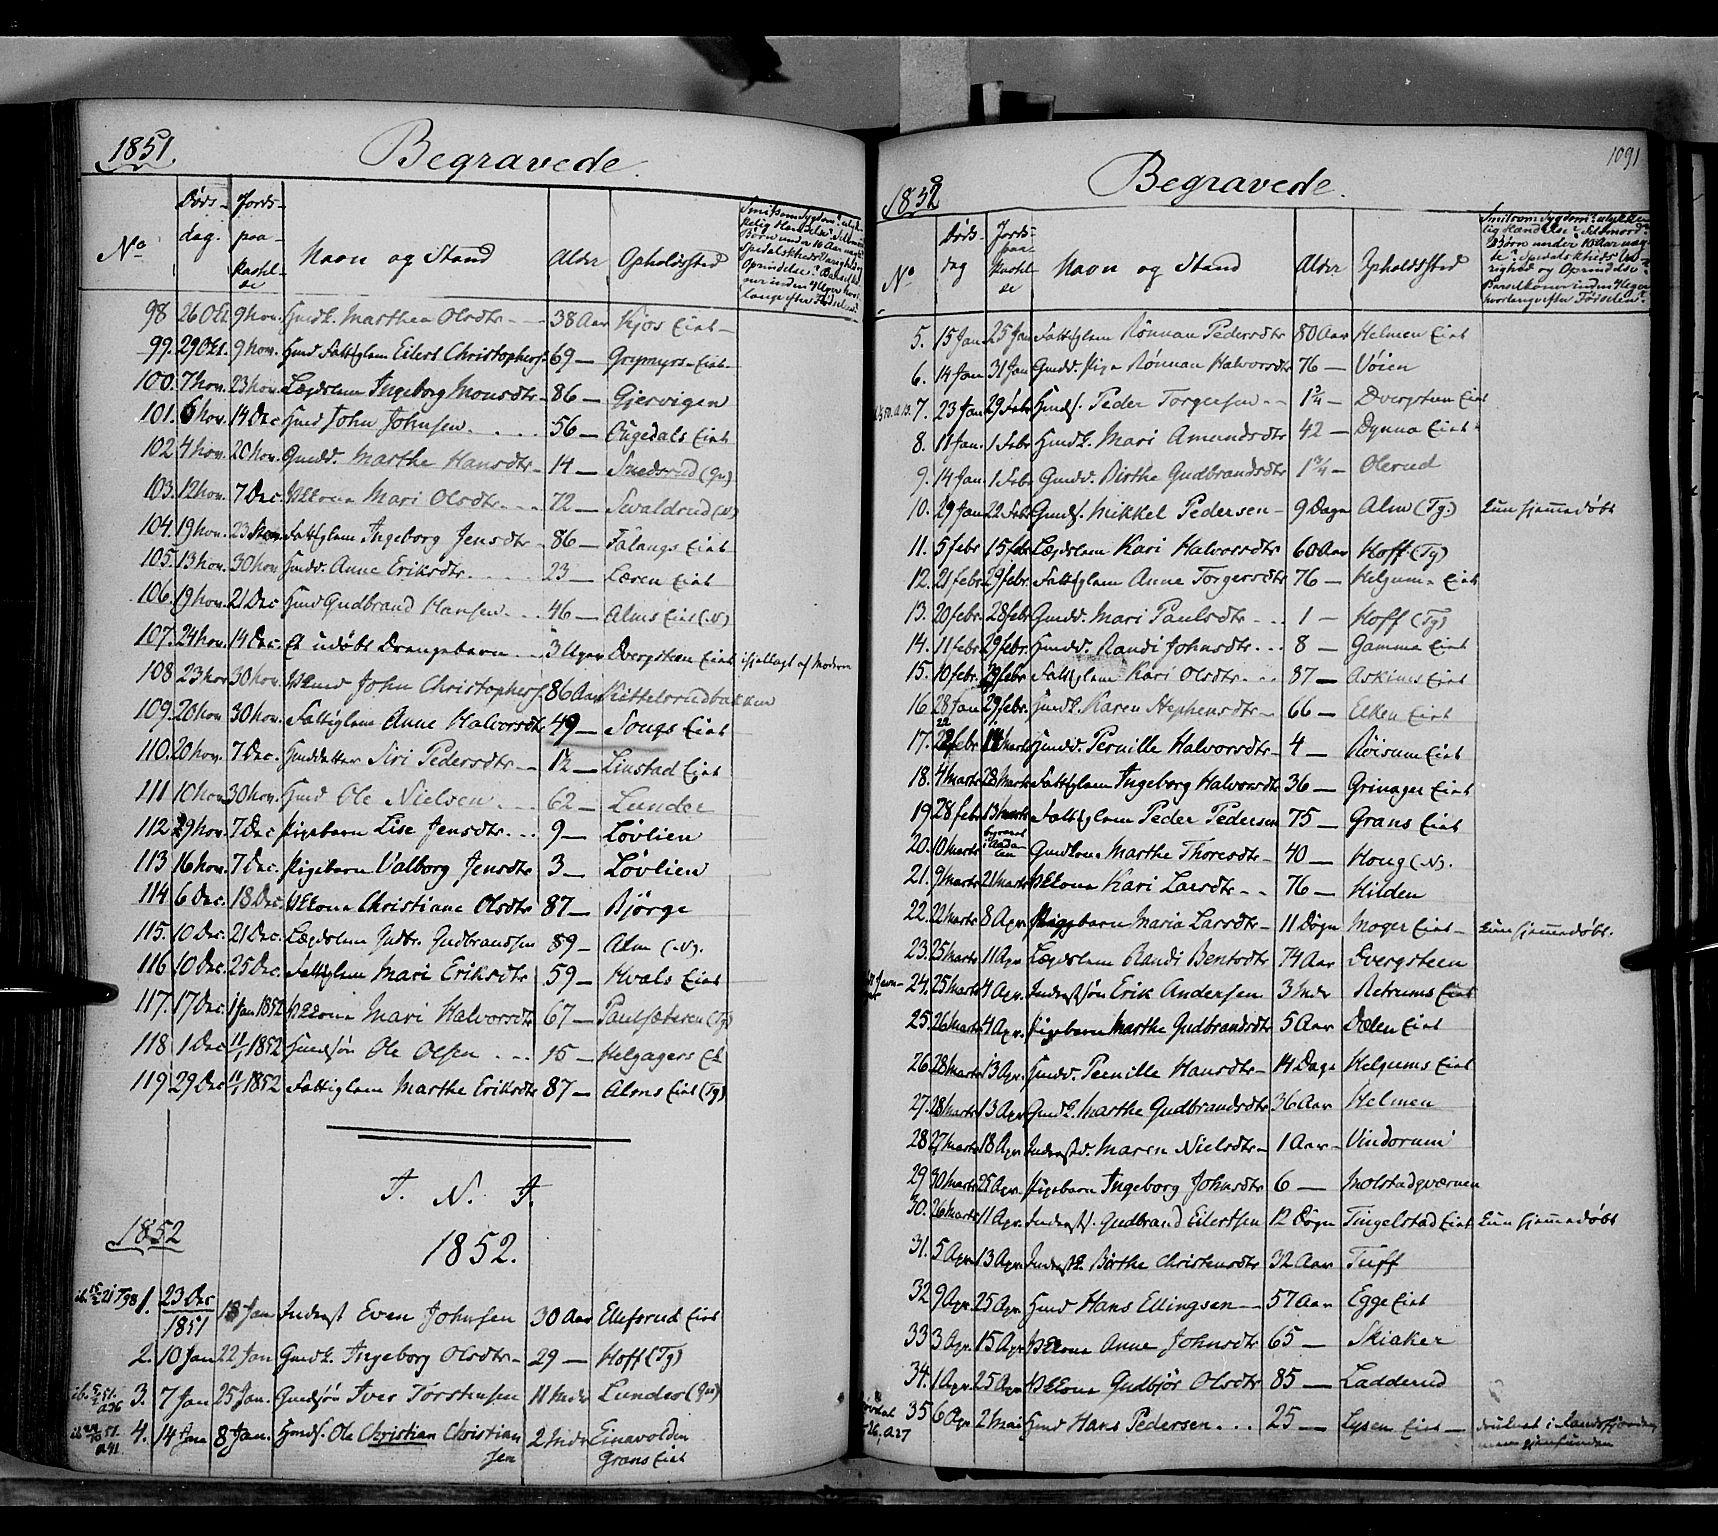 SAH, Gran prestekontor, Ministerialbok nr. 11, 1842-1856, s. 1090-1091